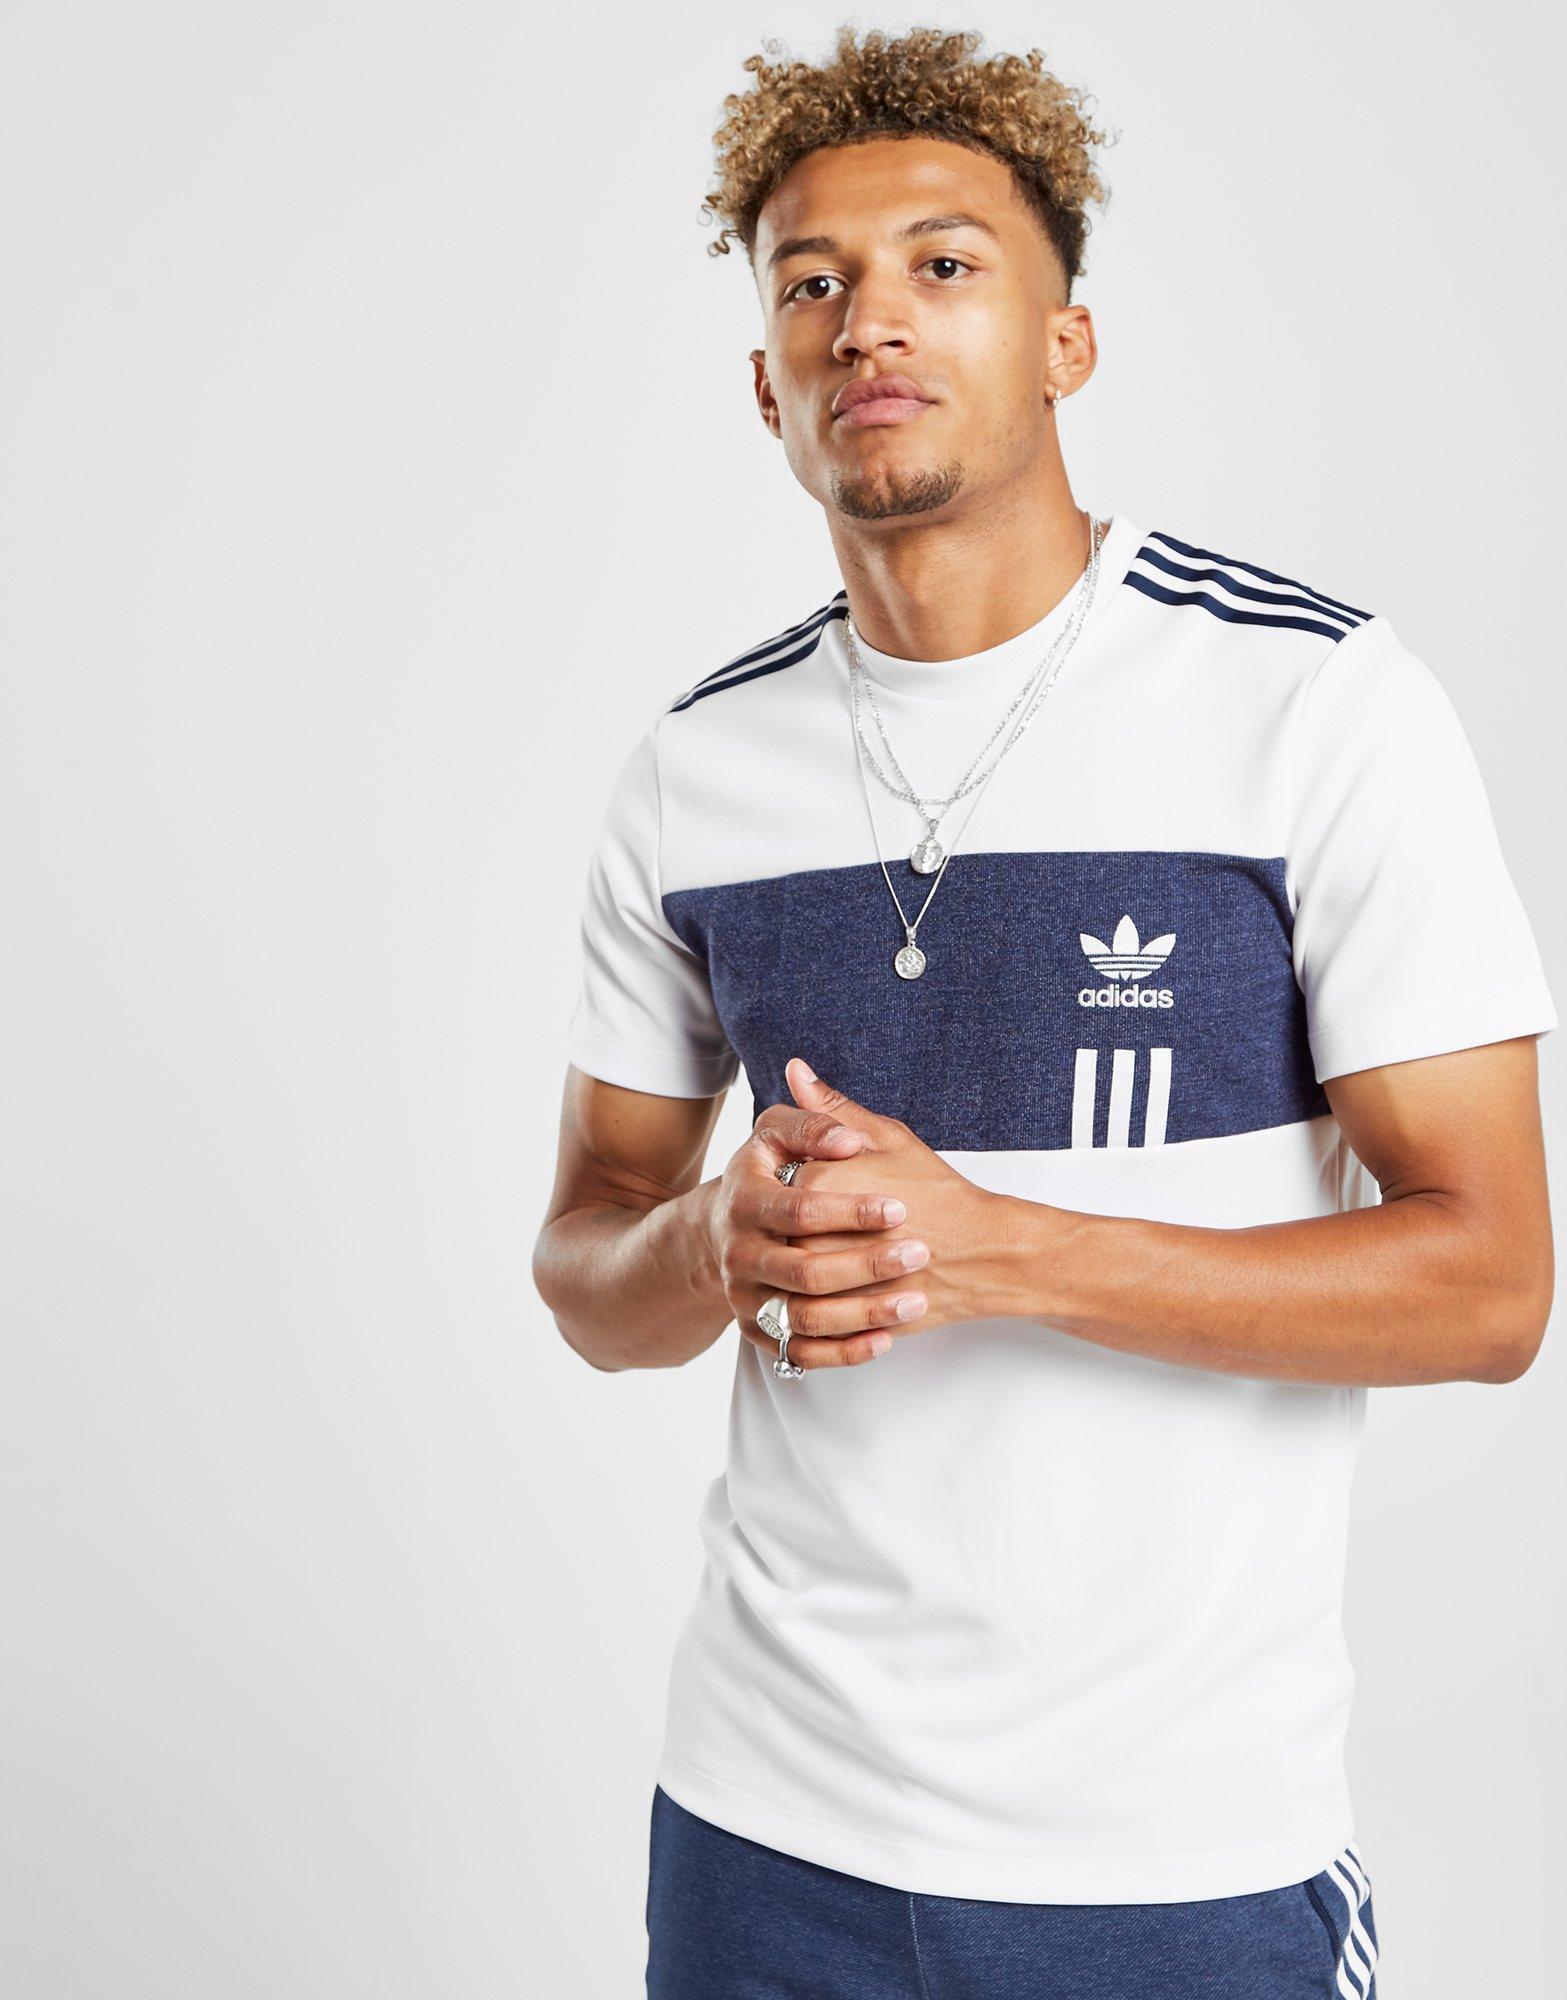 e9580ad7f adidas Originals Id96 Denim Poly T-shirt in Blue for Men - Lyst